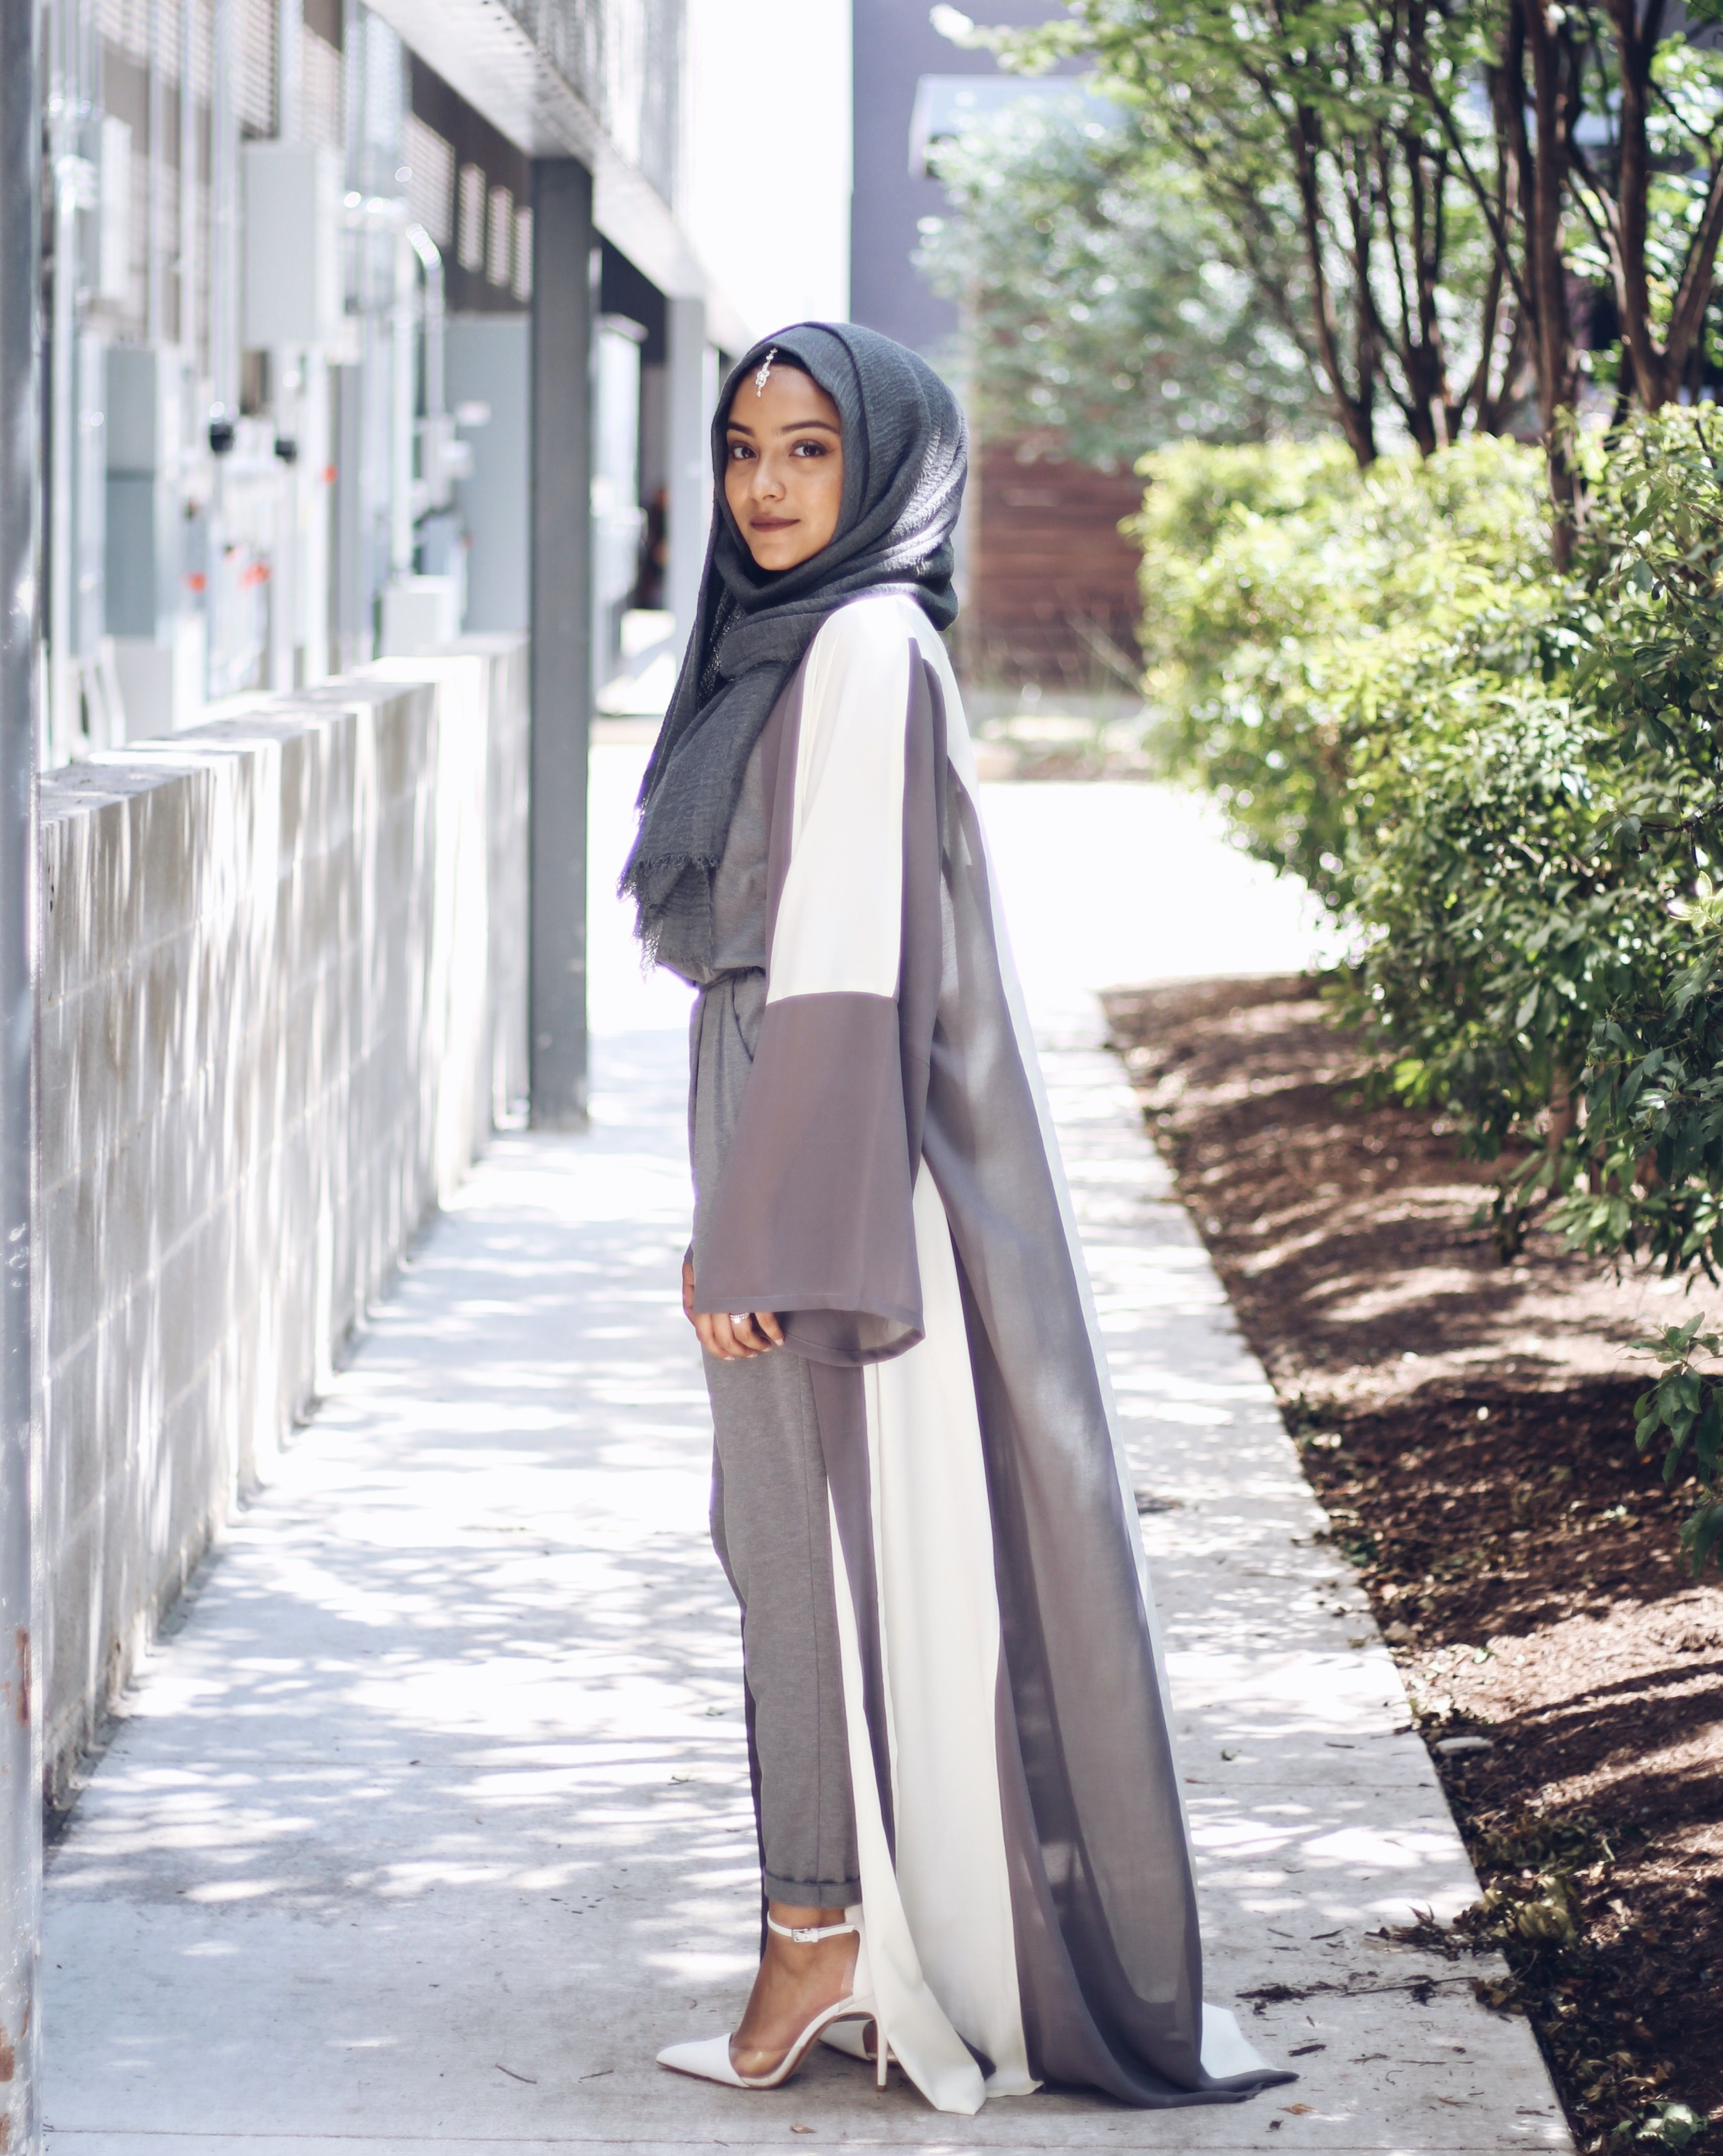 e6228d8786141 abaya fashion hijab fashion instagram kimono open abaya  www.veiledcollection.com